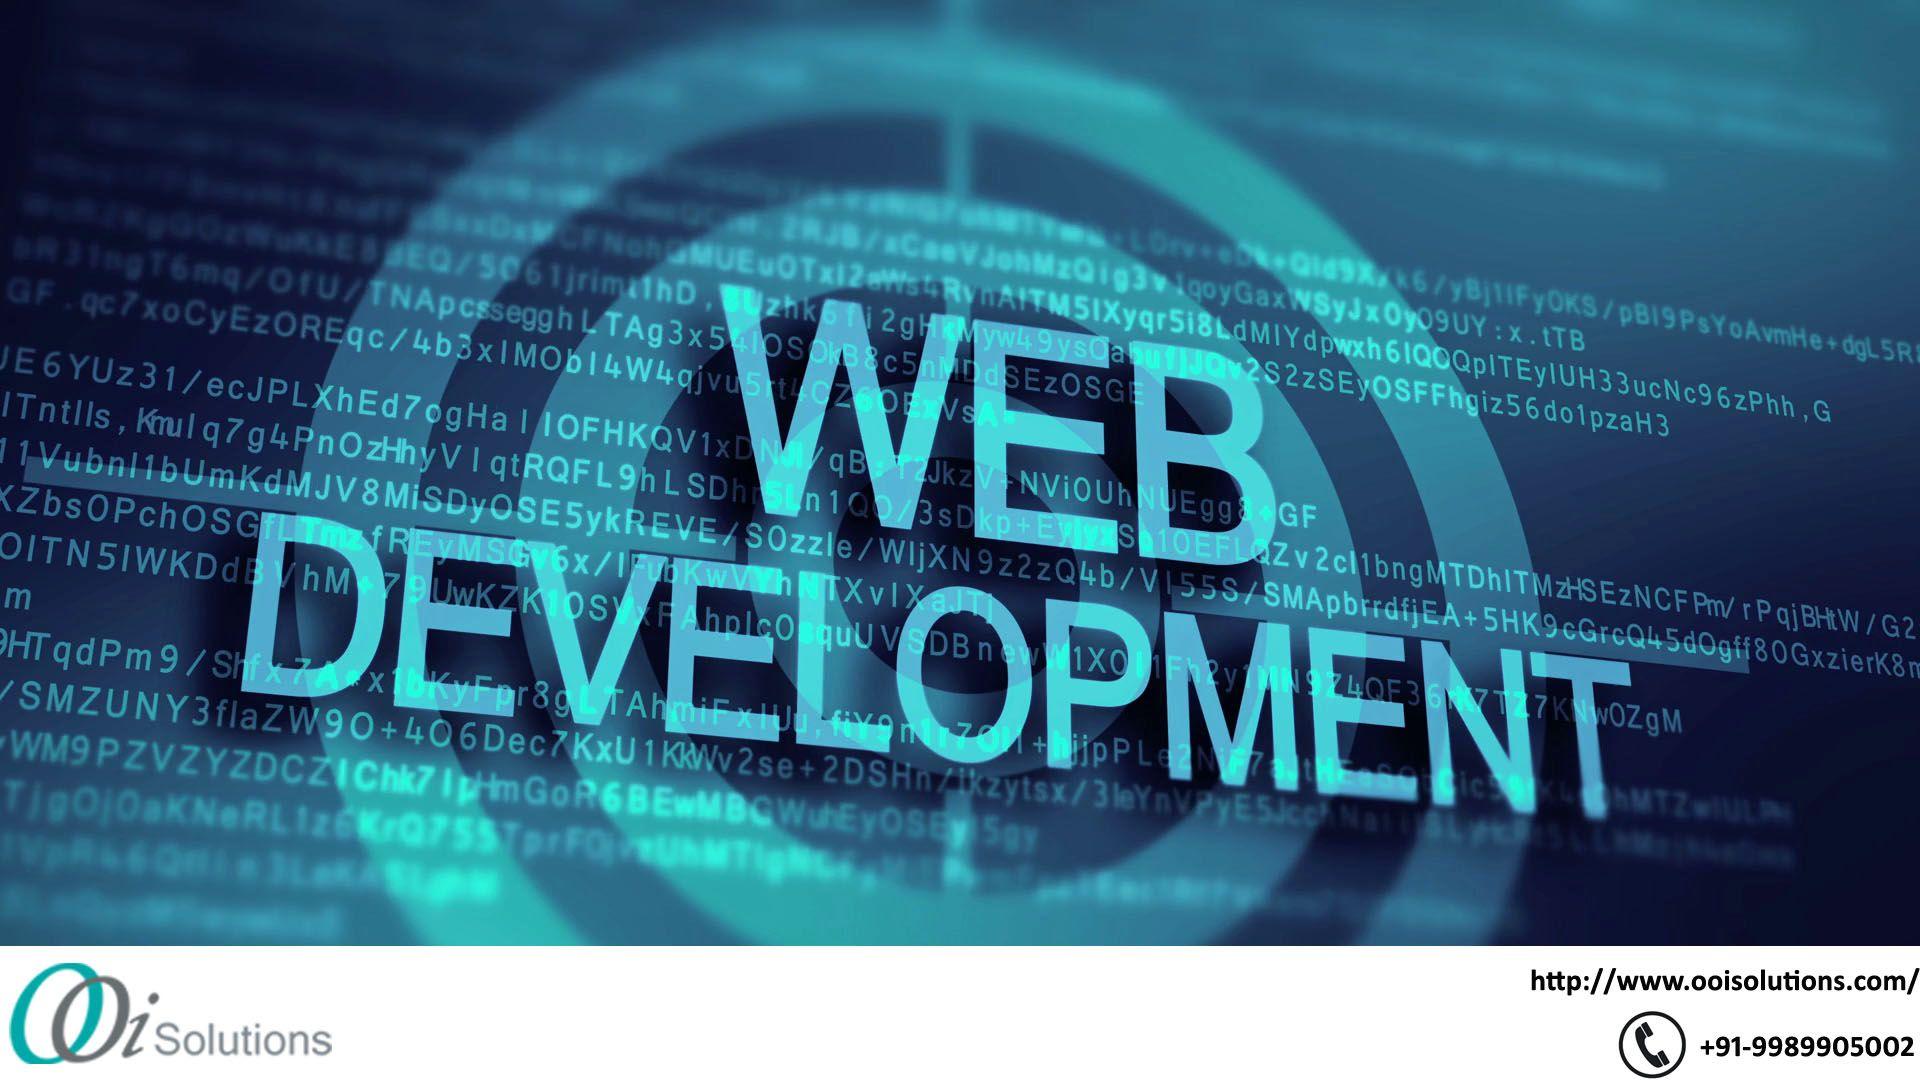 Ooi Solutions Is A Web Development Company In Vijayawada Offers Professional Website Develop Development Ecommerce Website Development Web Development Company